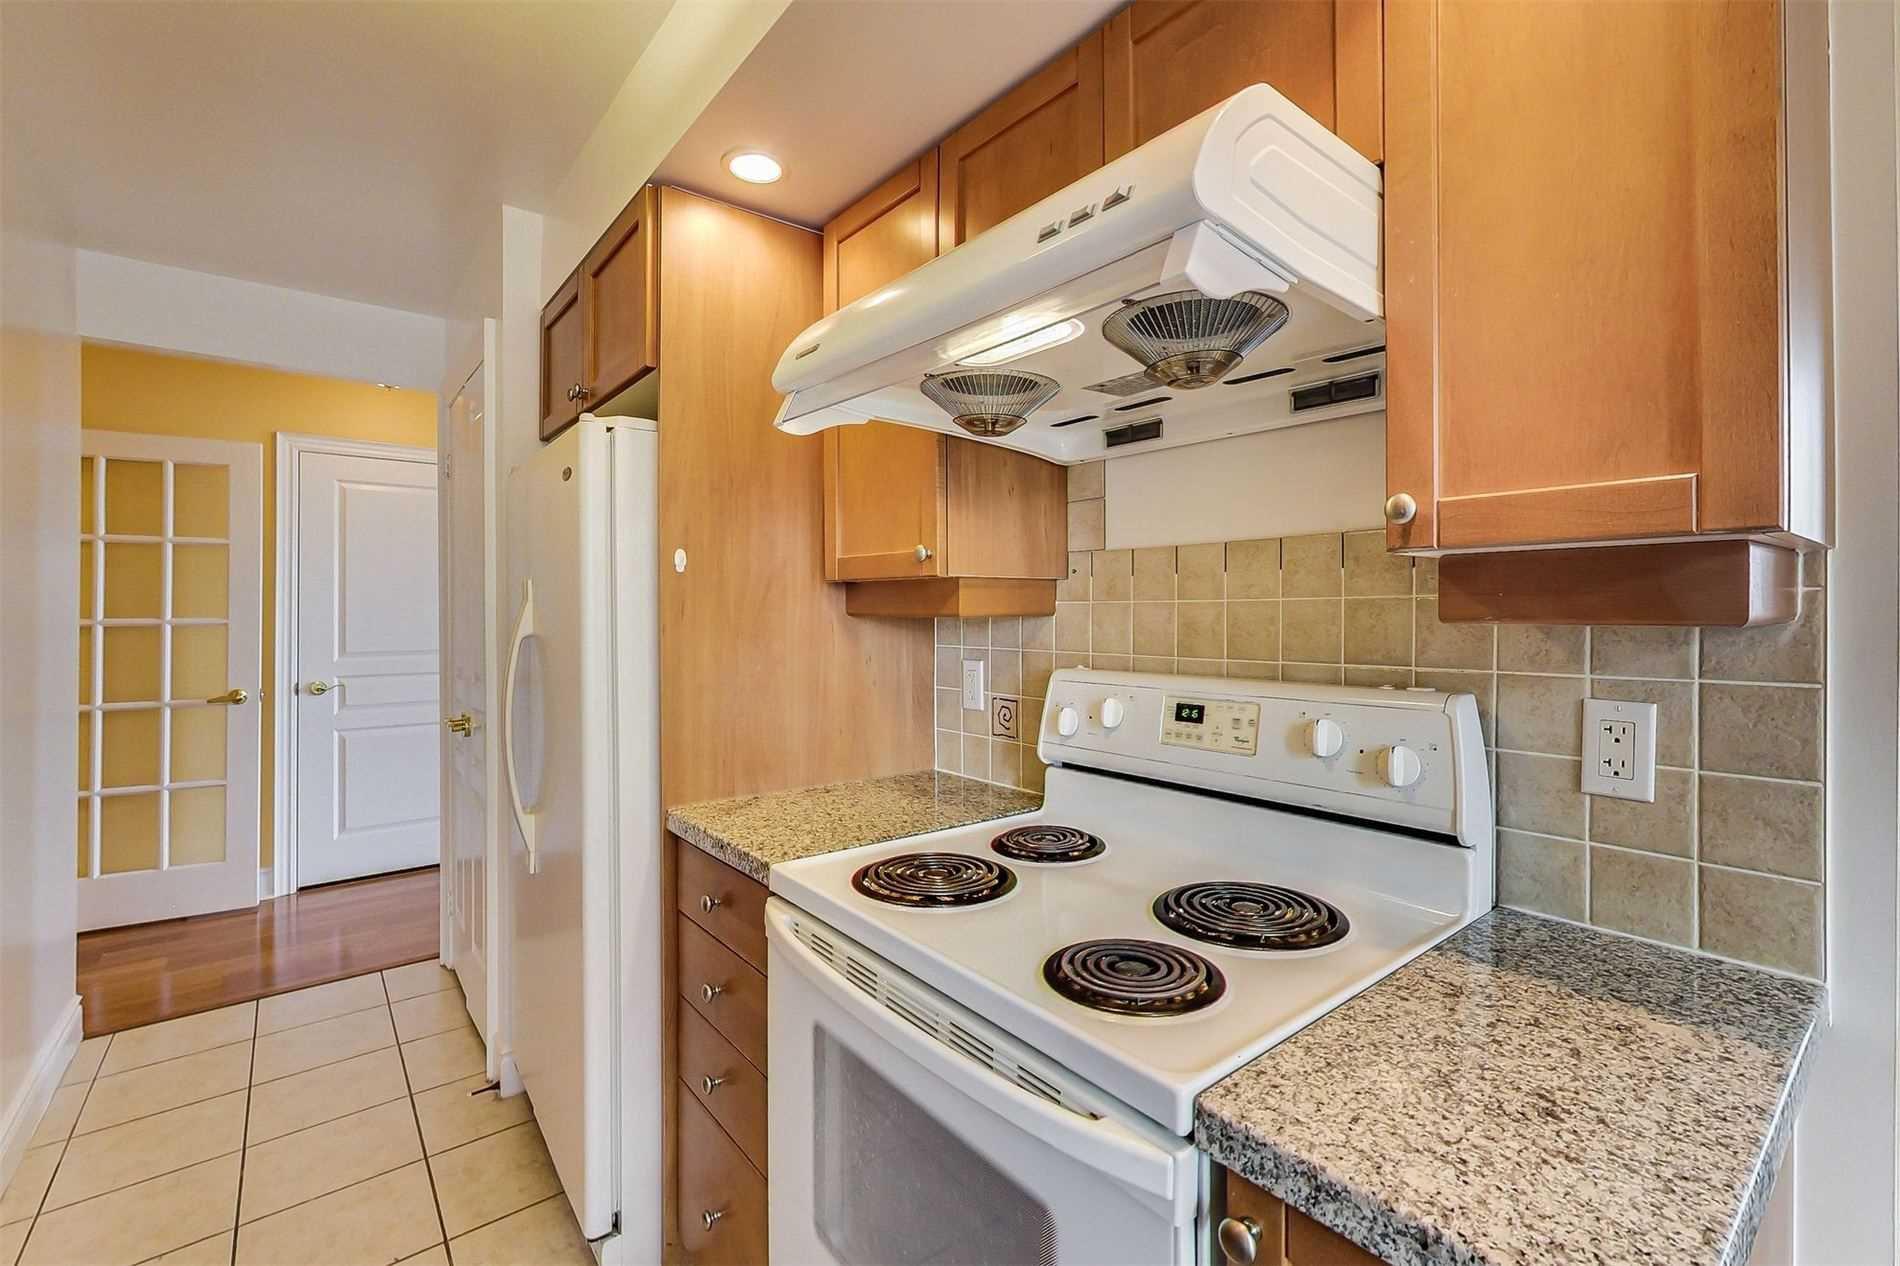 Photo 11: Photos: 1204 10 Northtown Way in Toronto: Willowdale East Condo for sale (Toronto C14)  : MLS®# C4648371